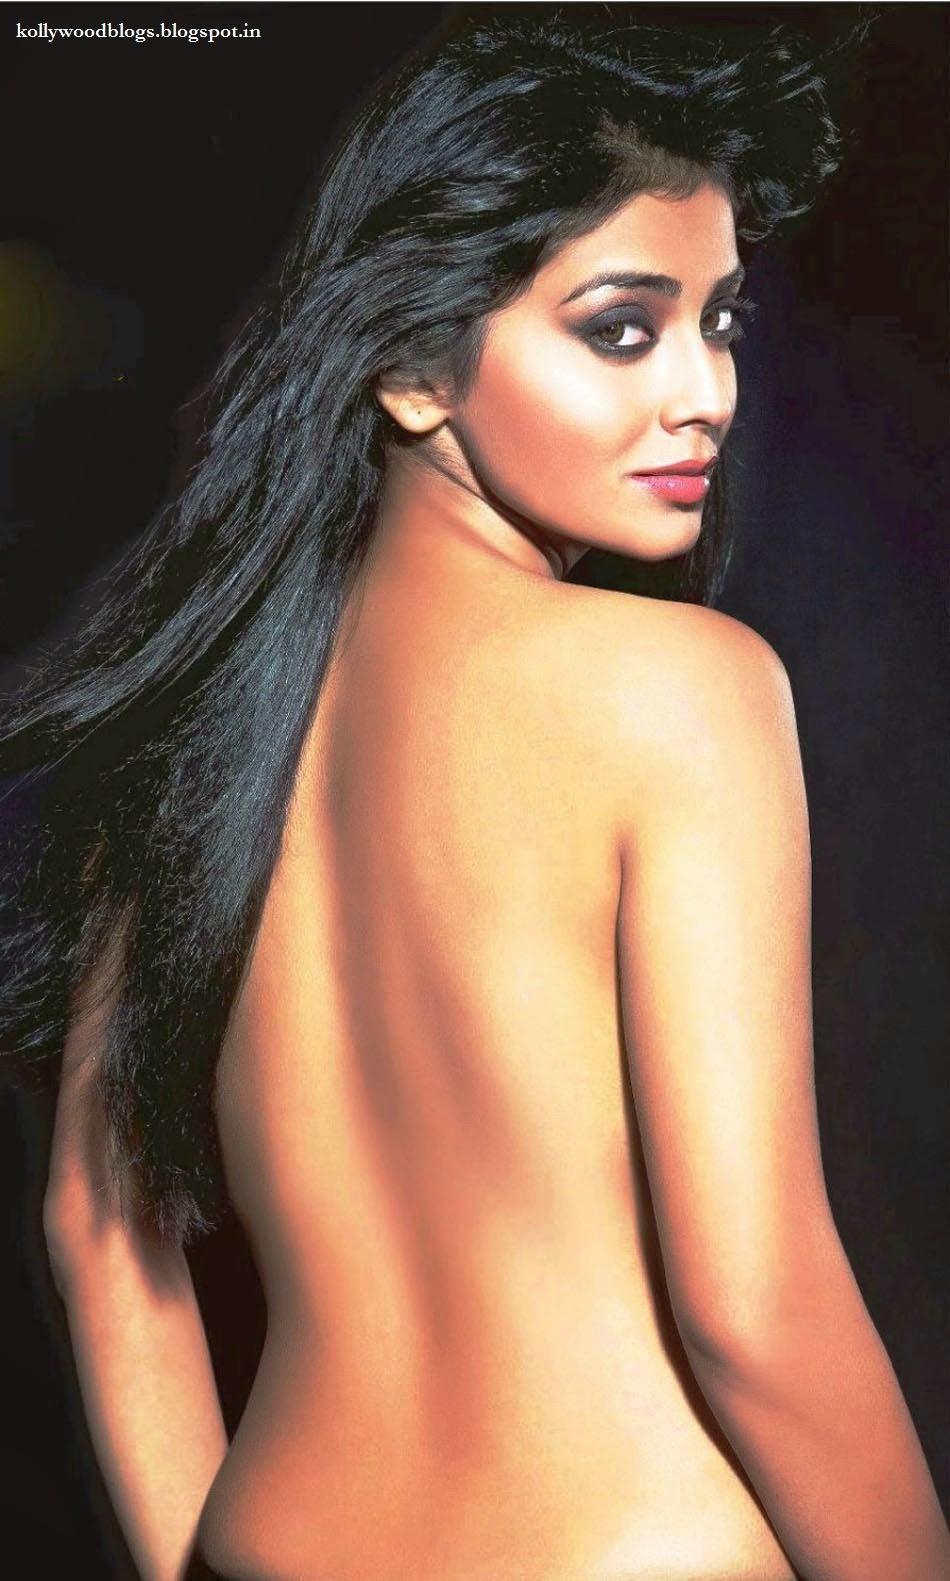 Kollywood Gallery Sexy Shriya Saran Exposing Pictures